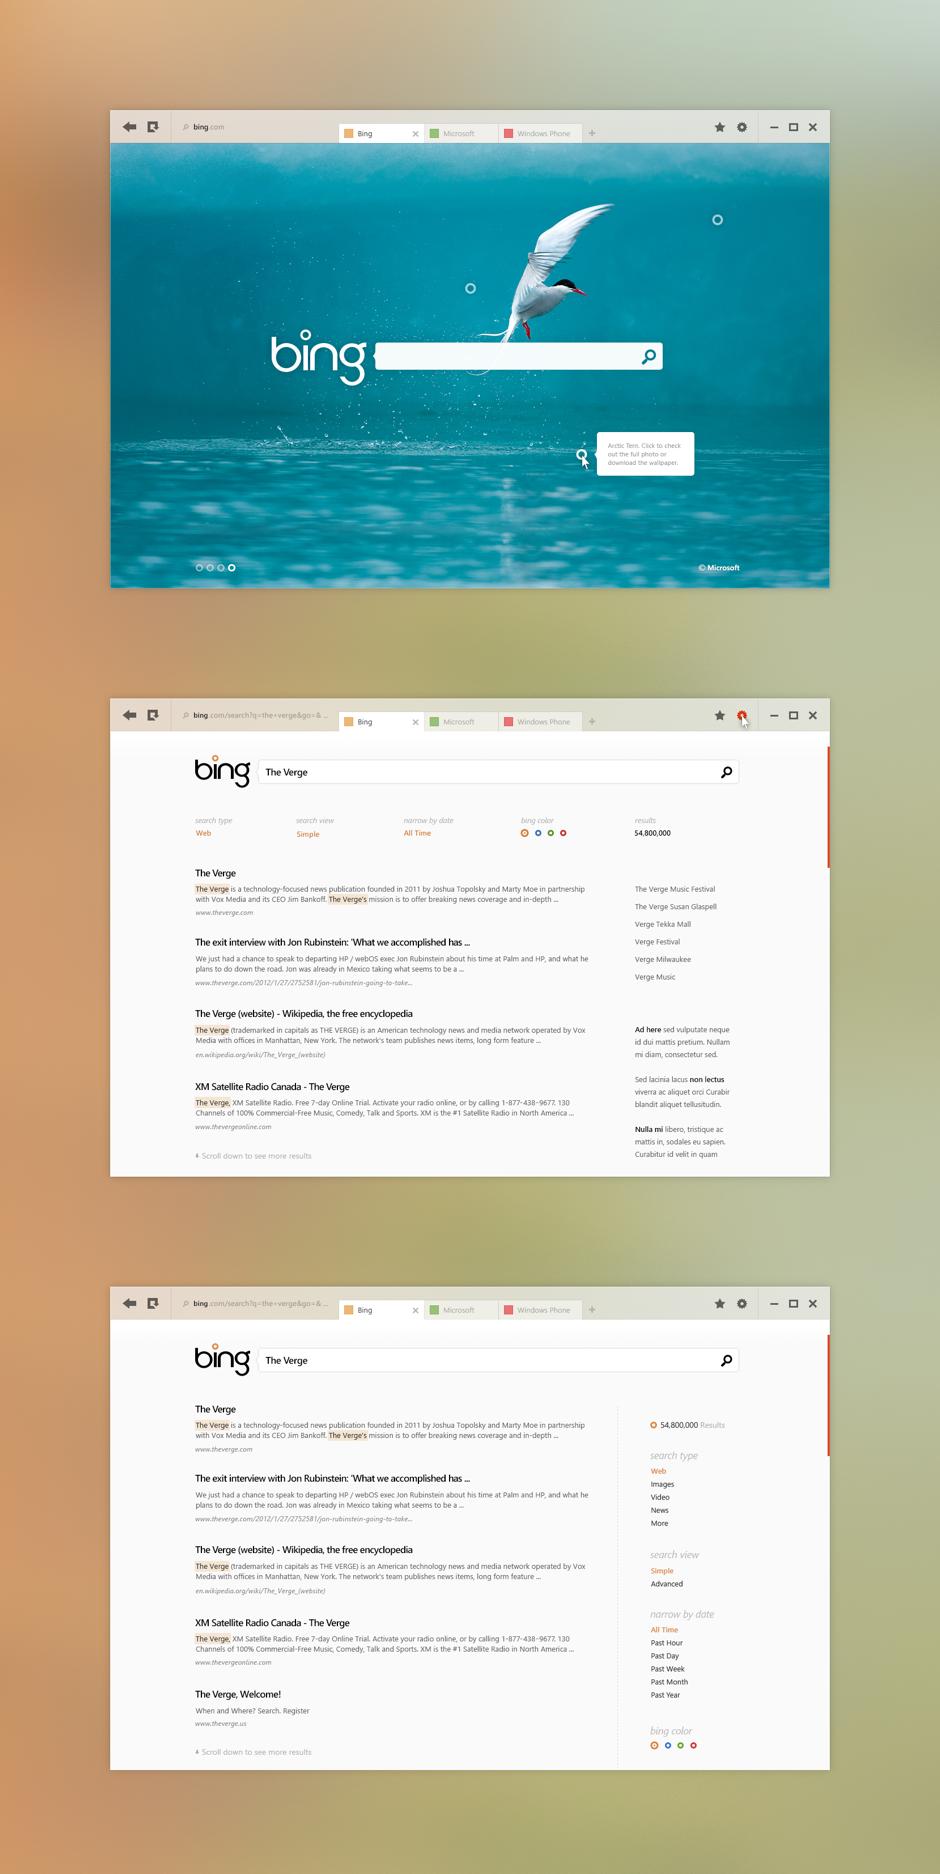 bing_full.png